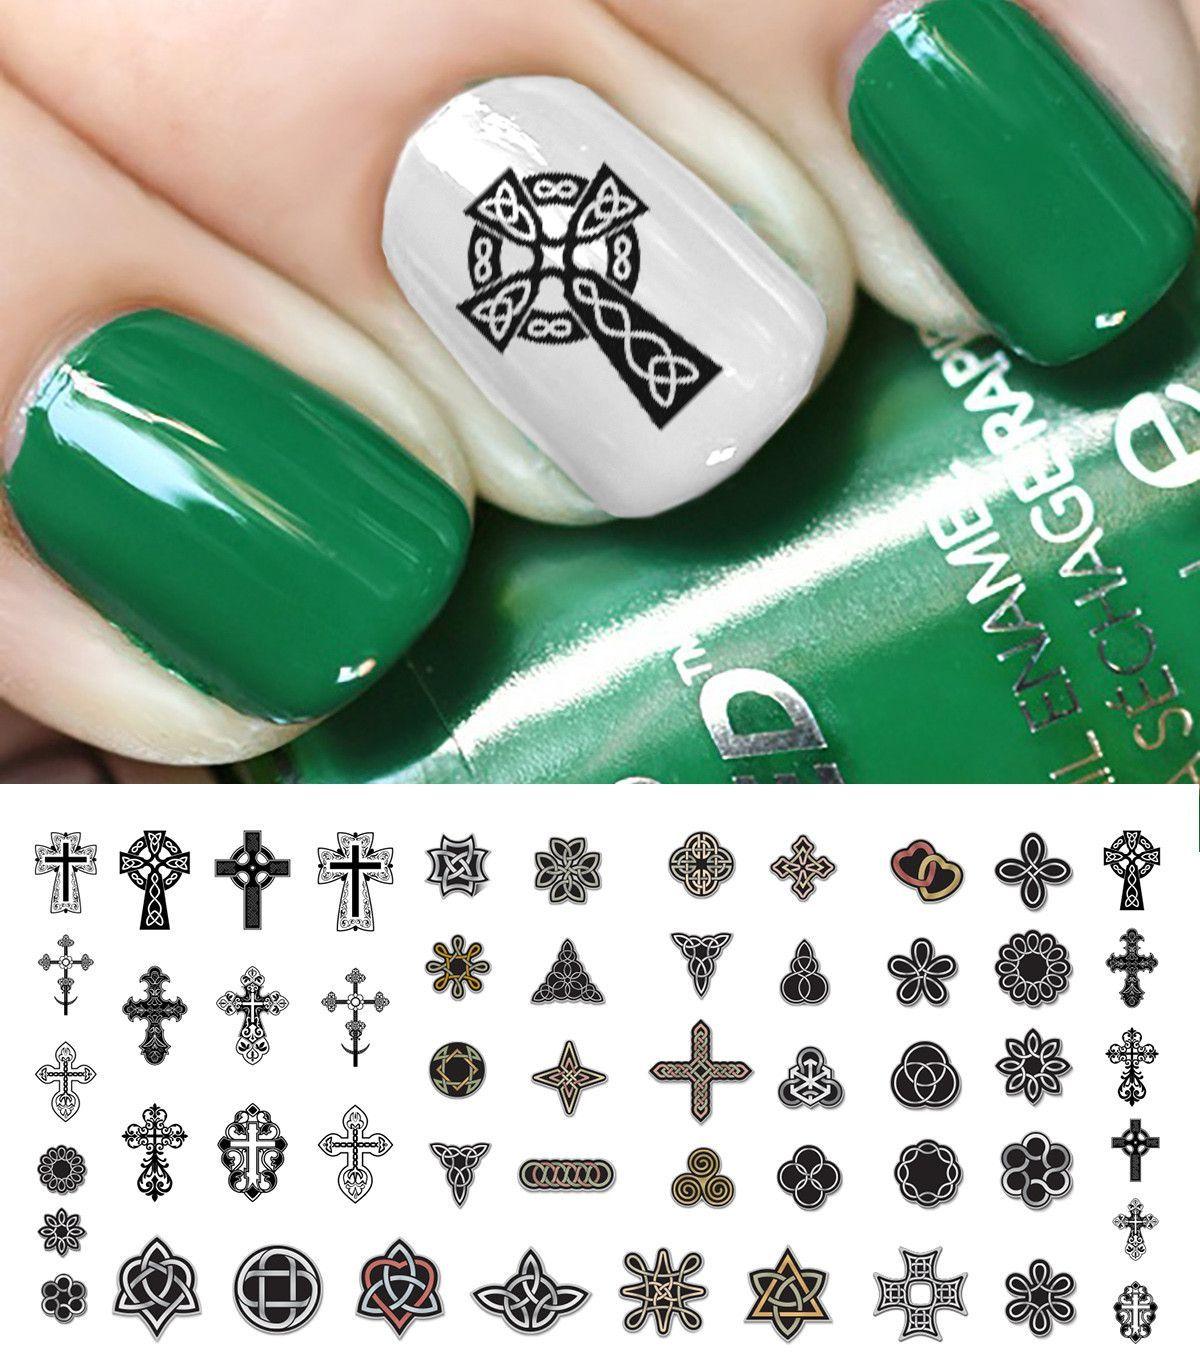 Celtic Cross Art Nail Art Decals Set #1 | Pinterest